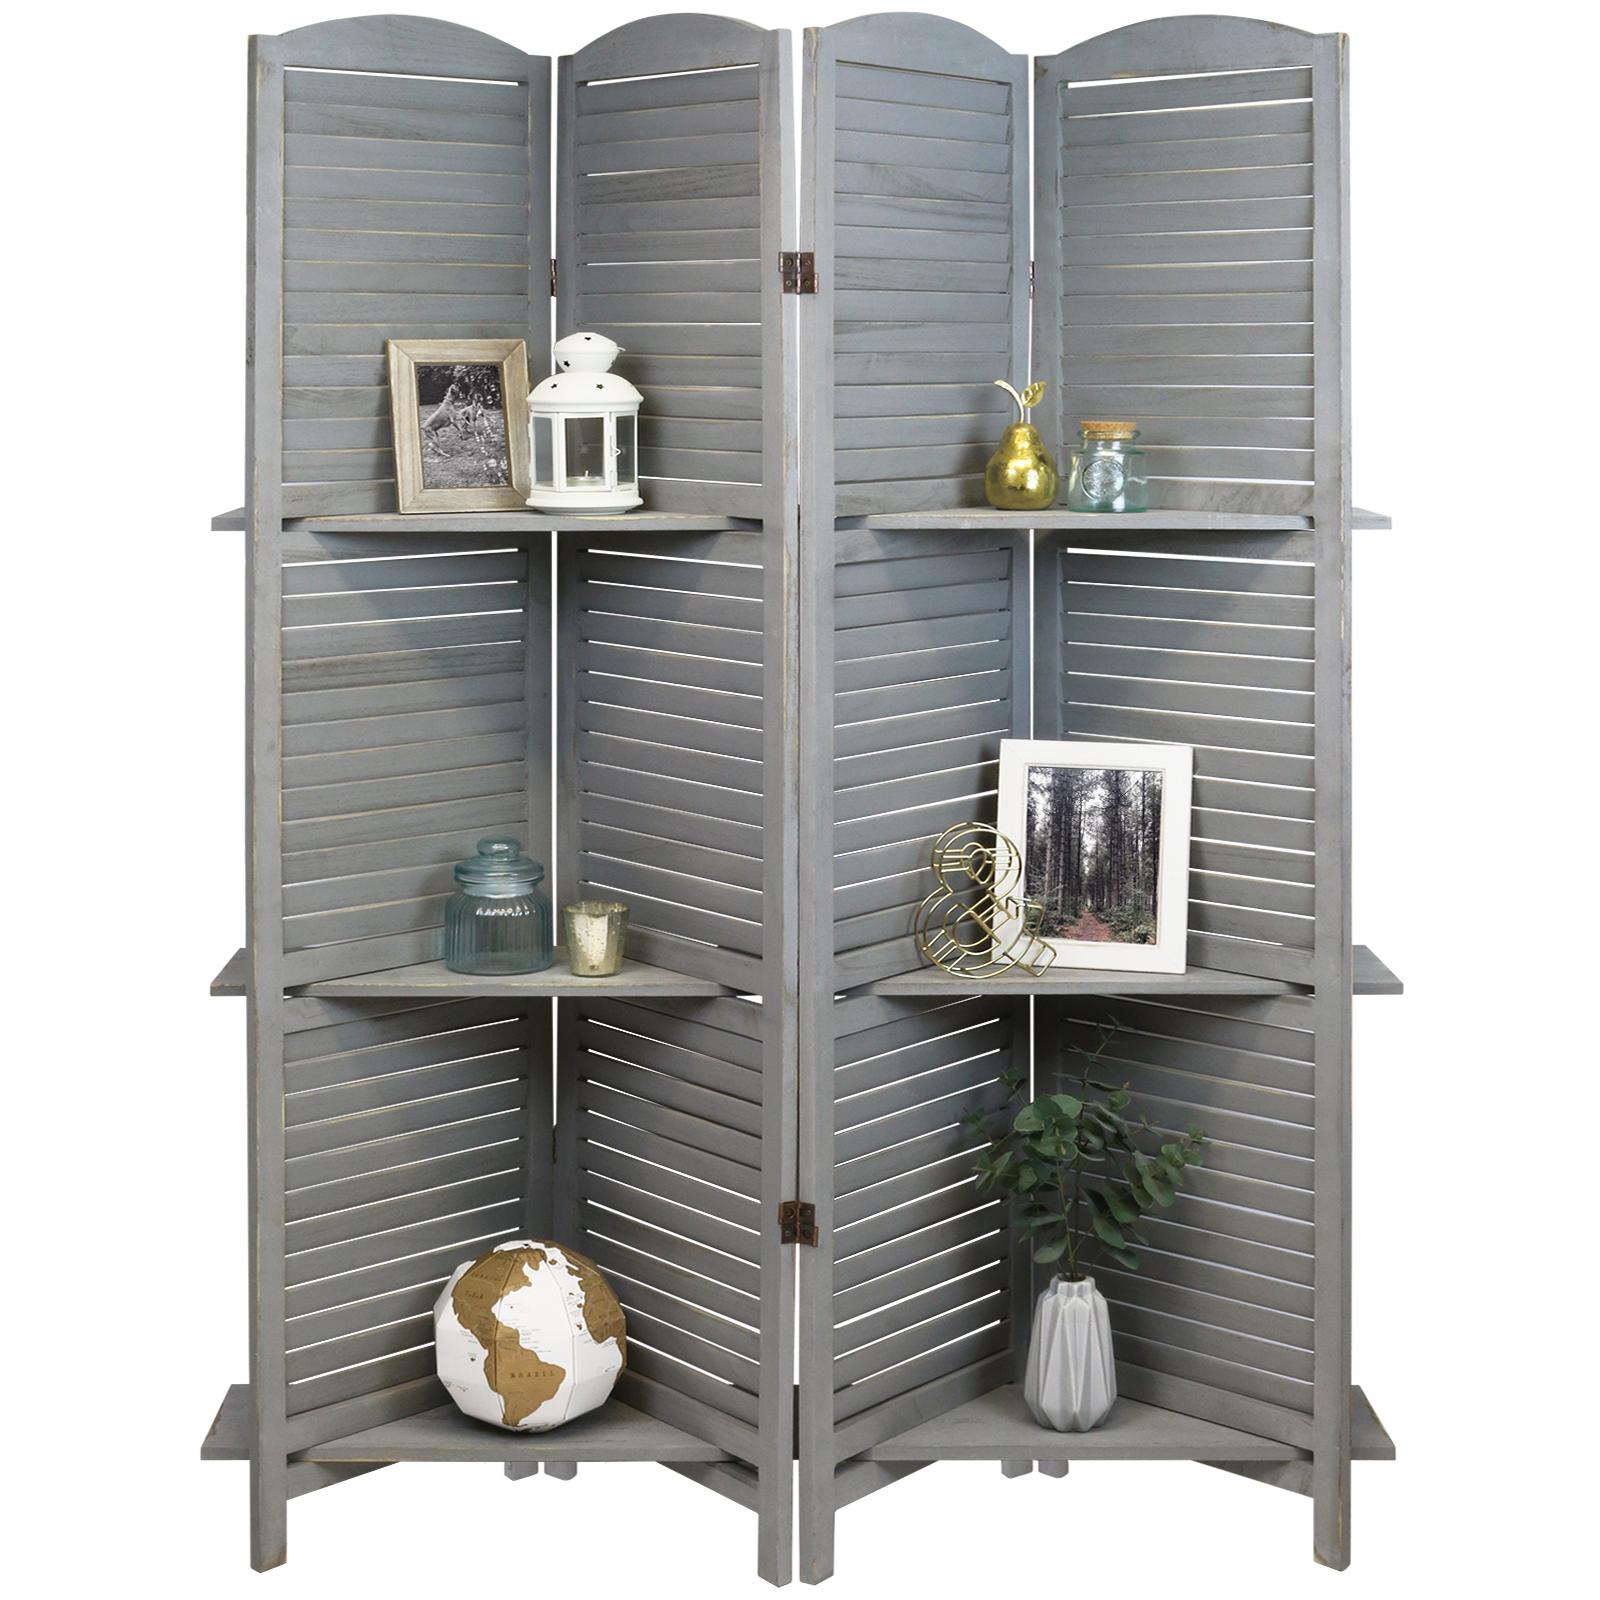 Hartleys 4 Panel Grey Vintage 3 Tier Shelf Room Divider